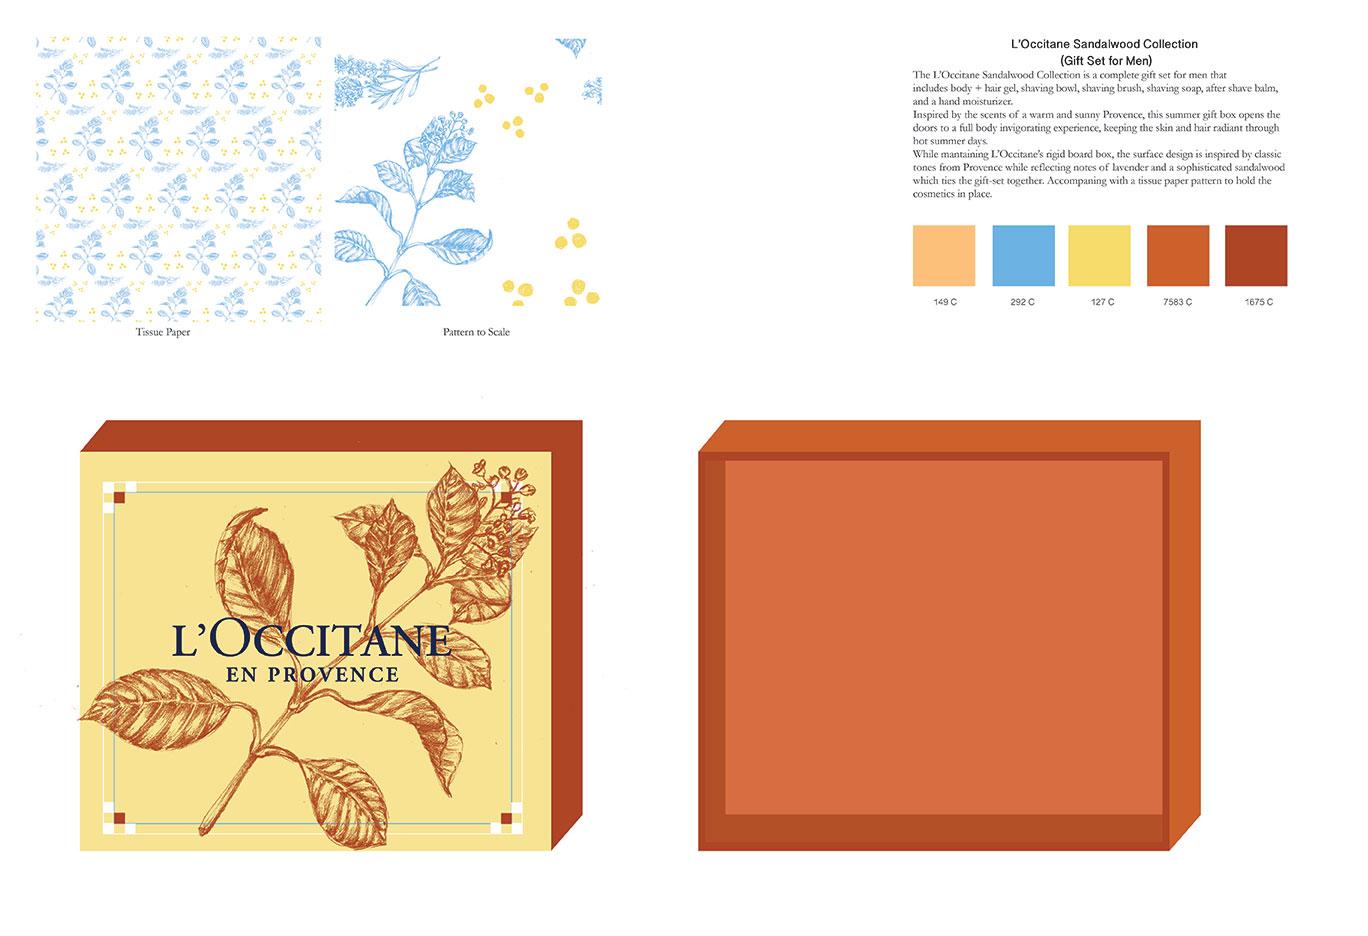 Cosmetics_Box_web.jpg